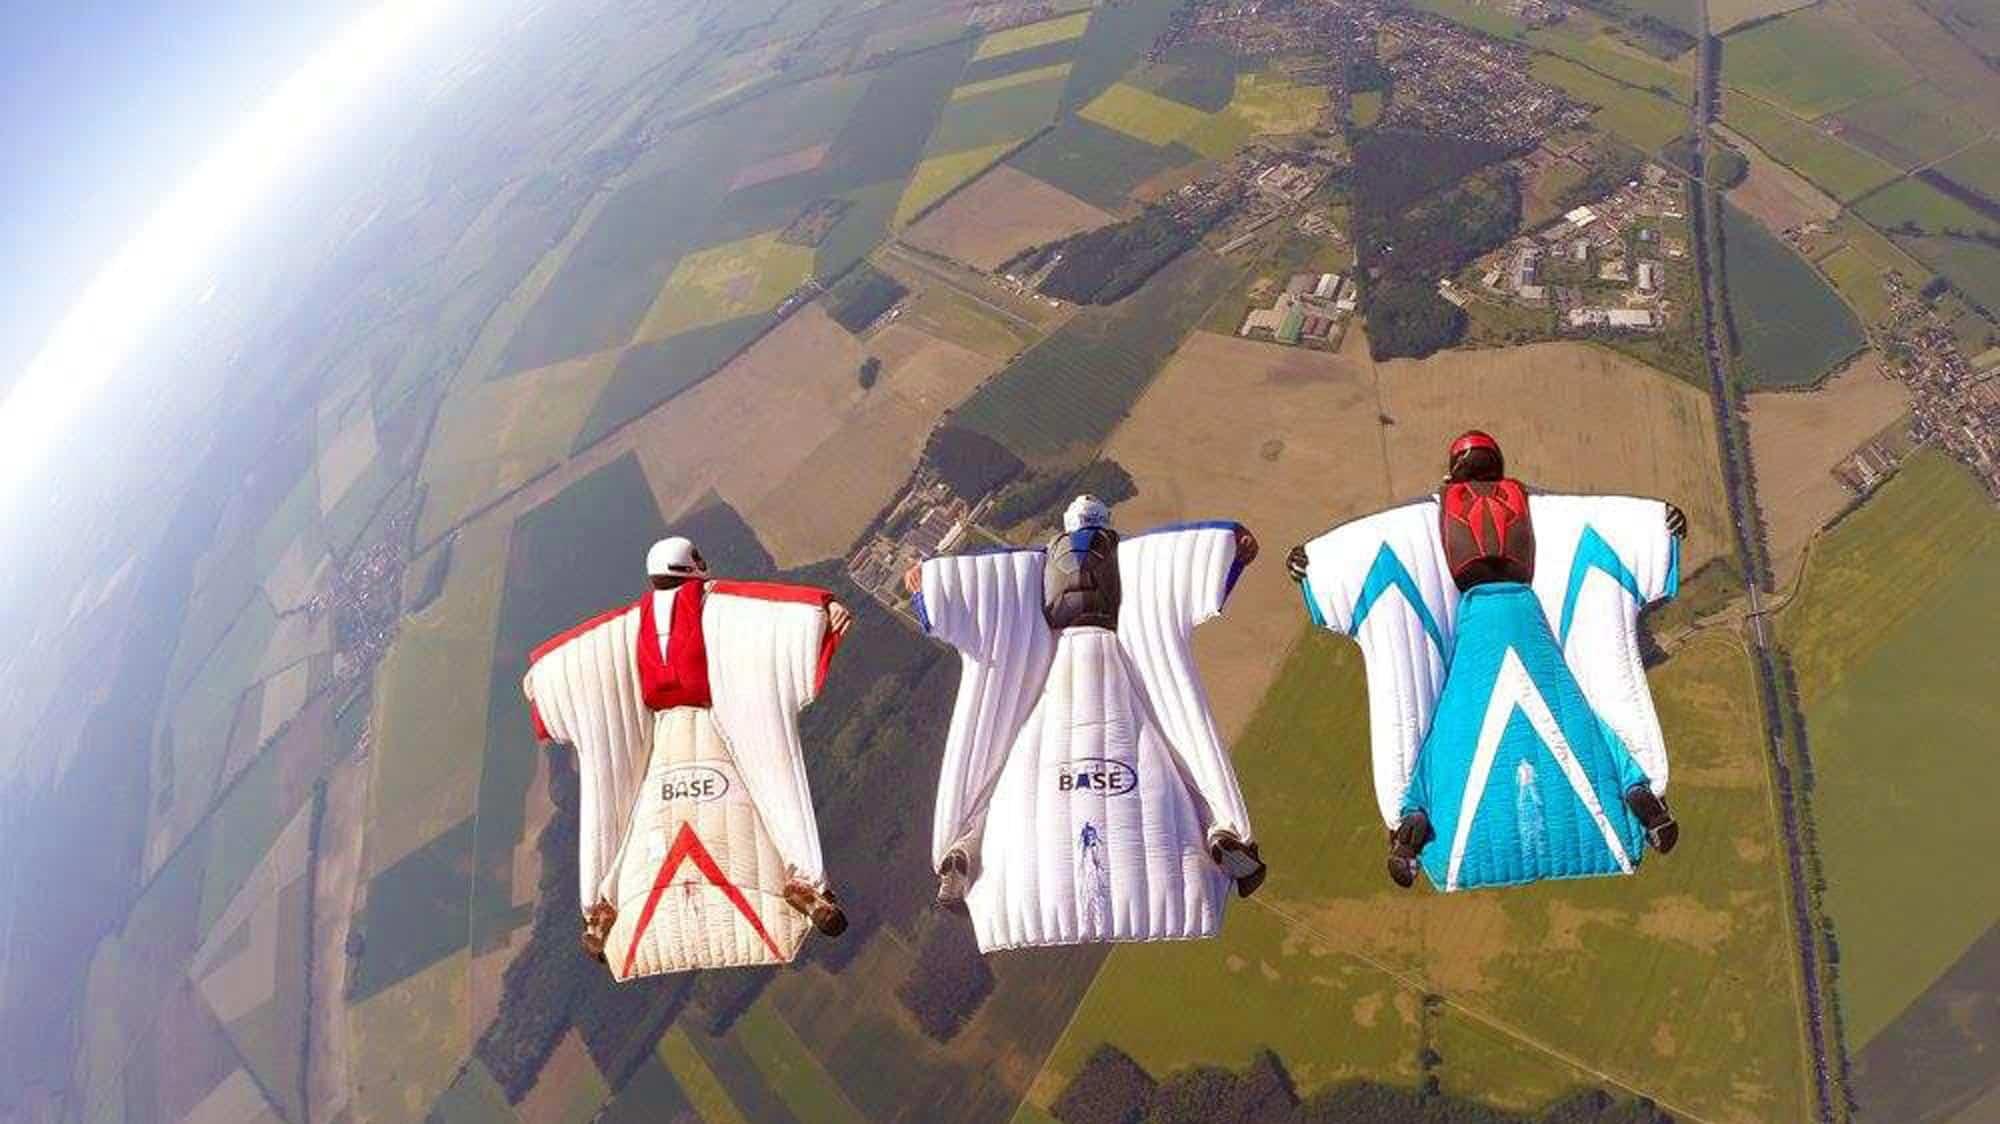 takeoff_fallschirmspringen-wingsuite-2-2000x1125